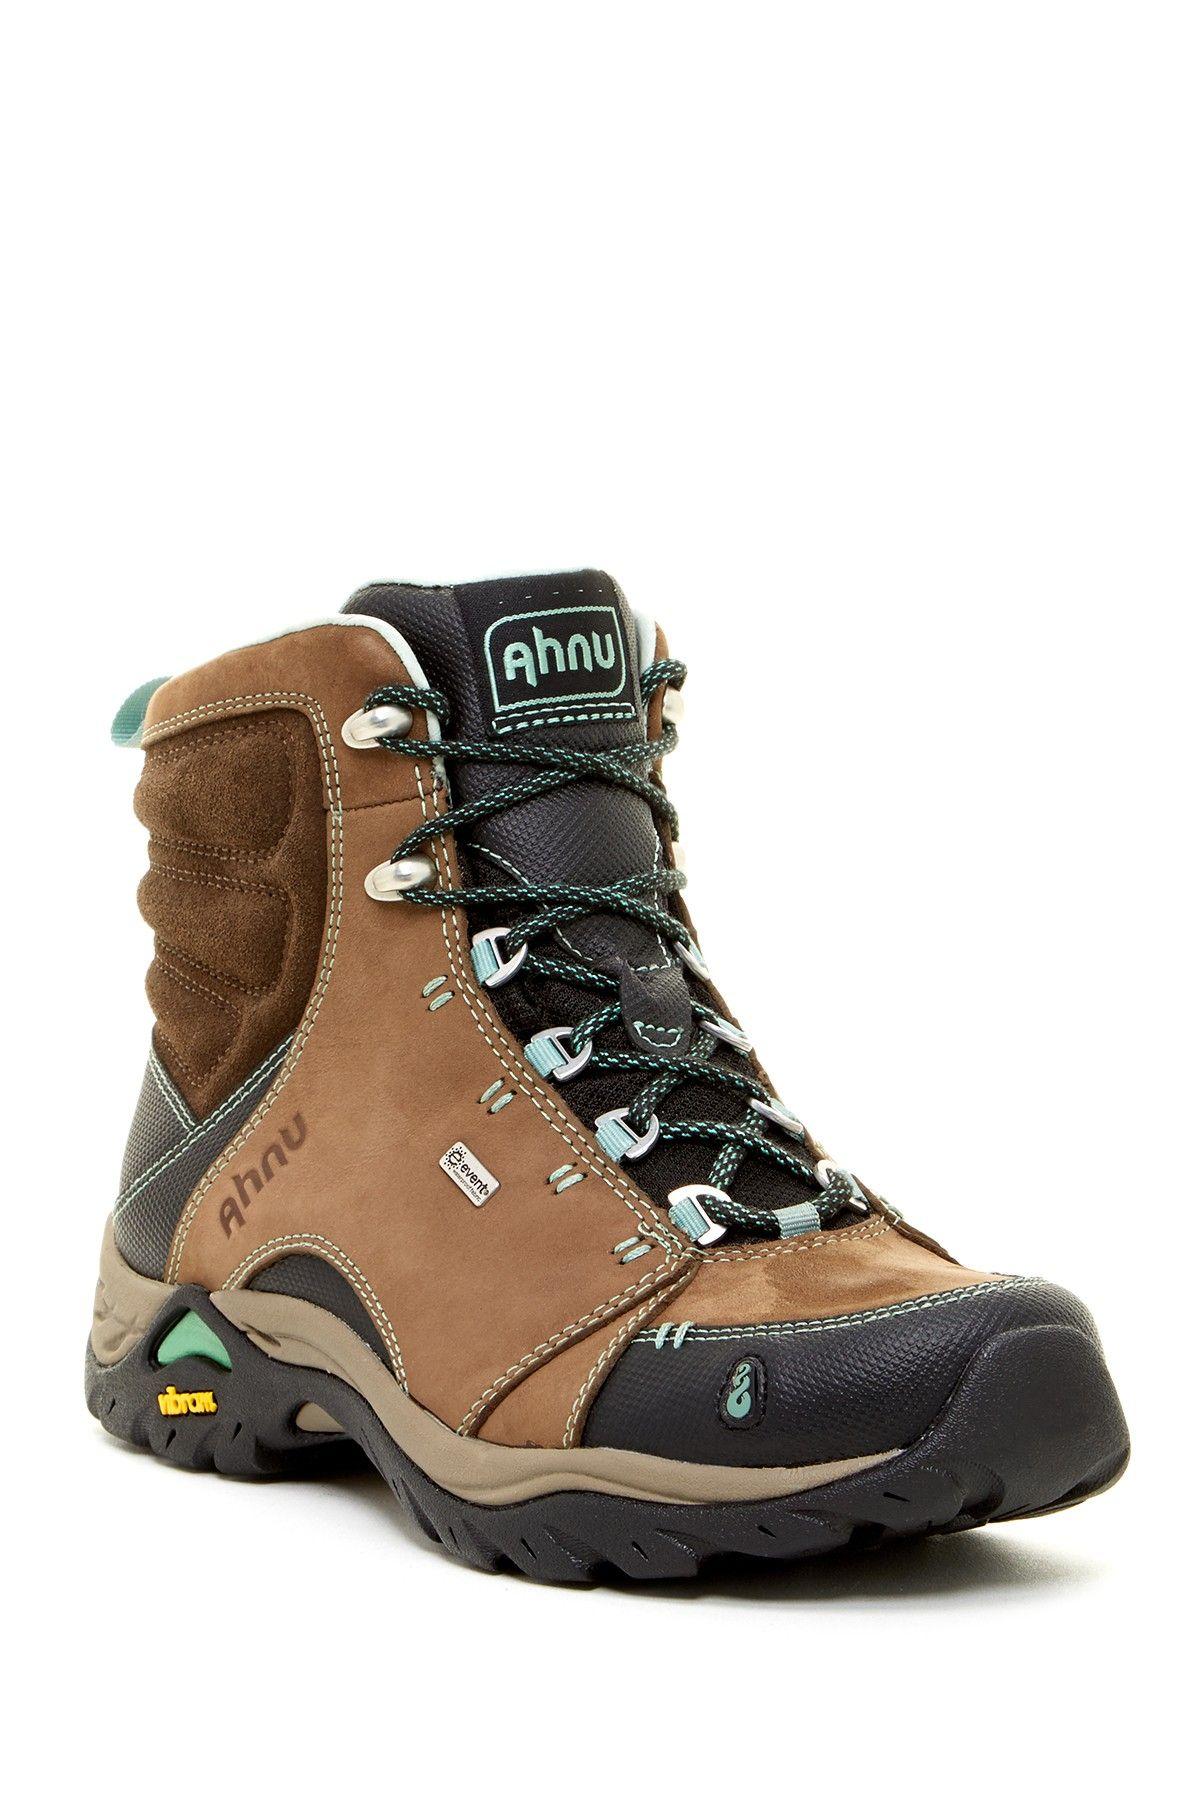 Ahnu Montara Waterproof Hiking Boot Shoes Hiking